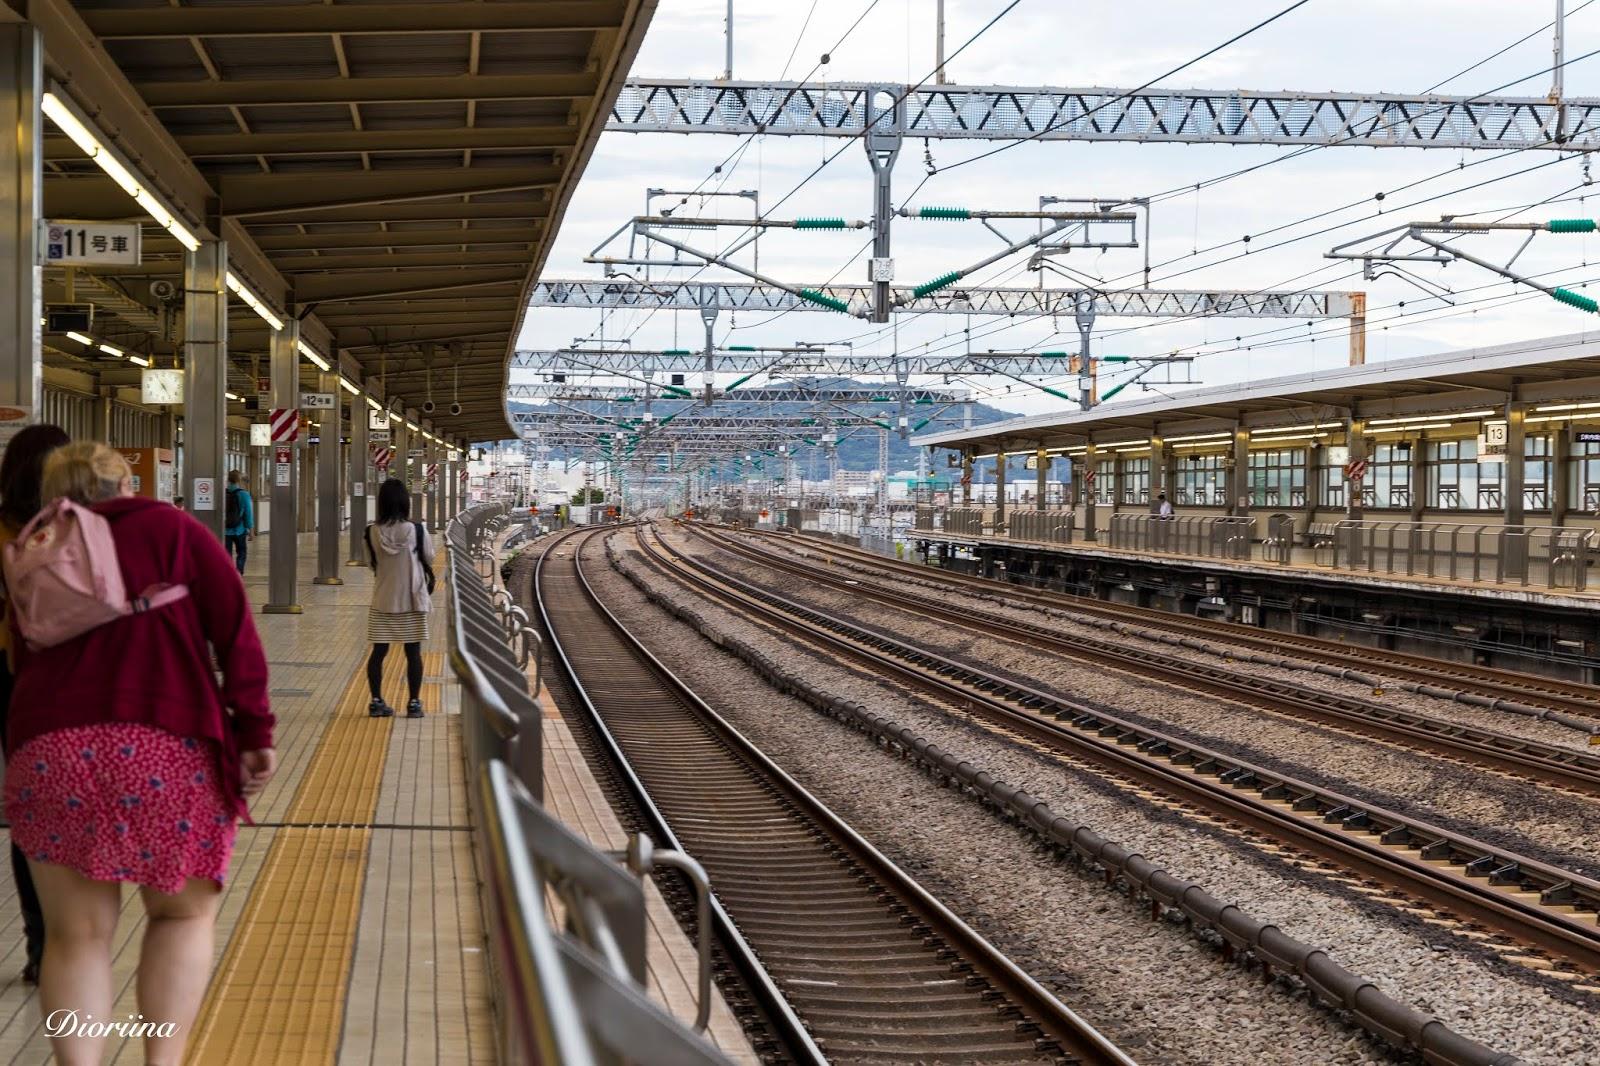 Japanin rautatieasema